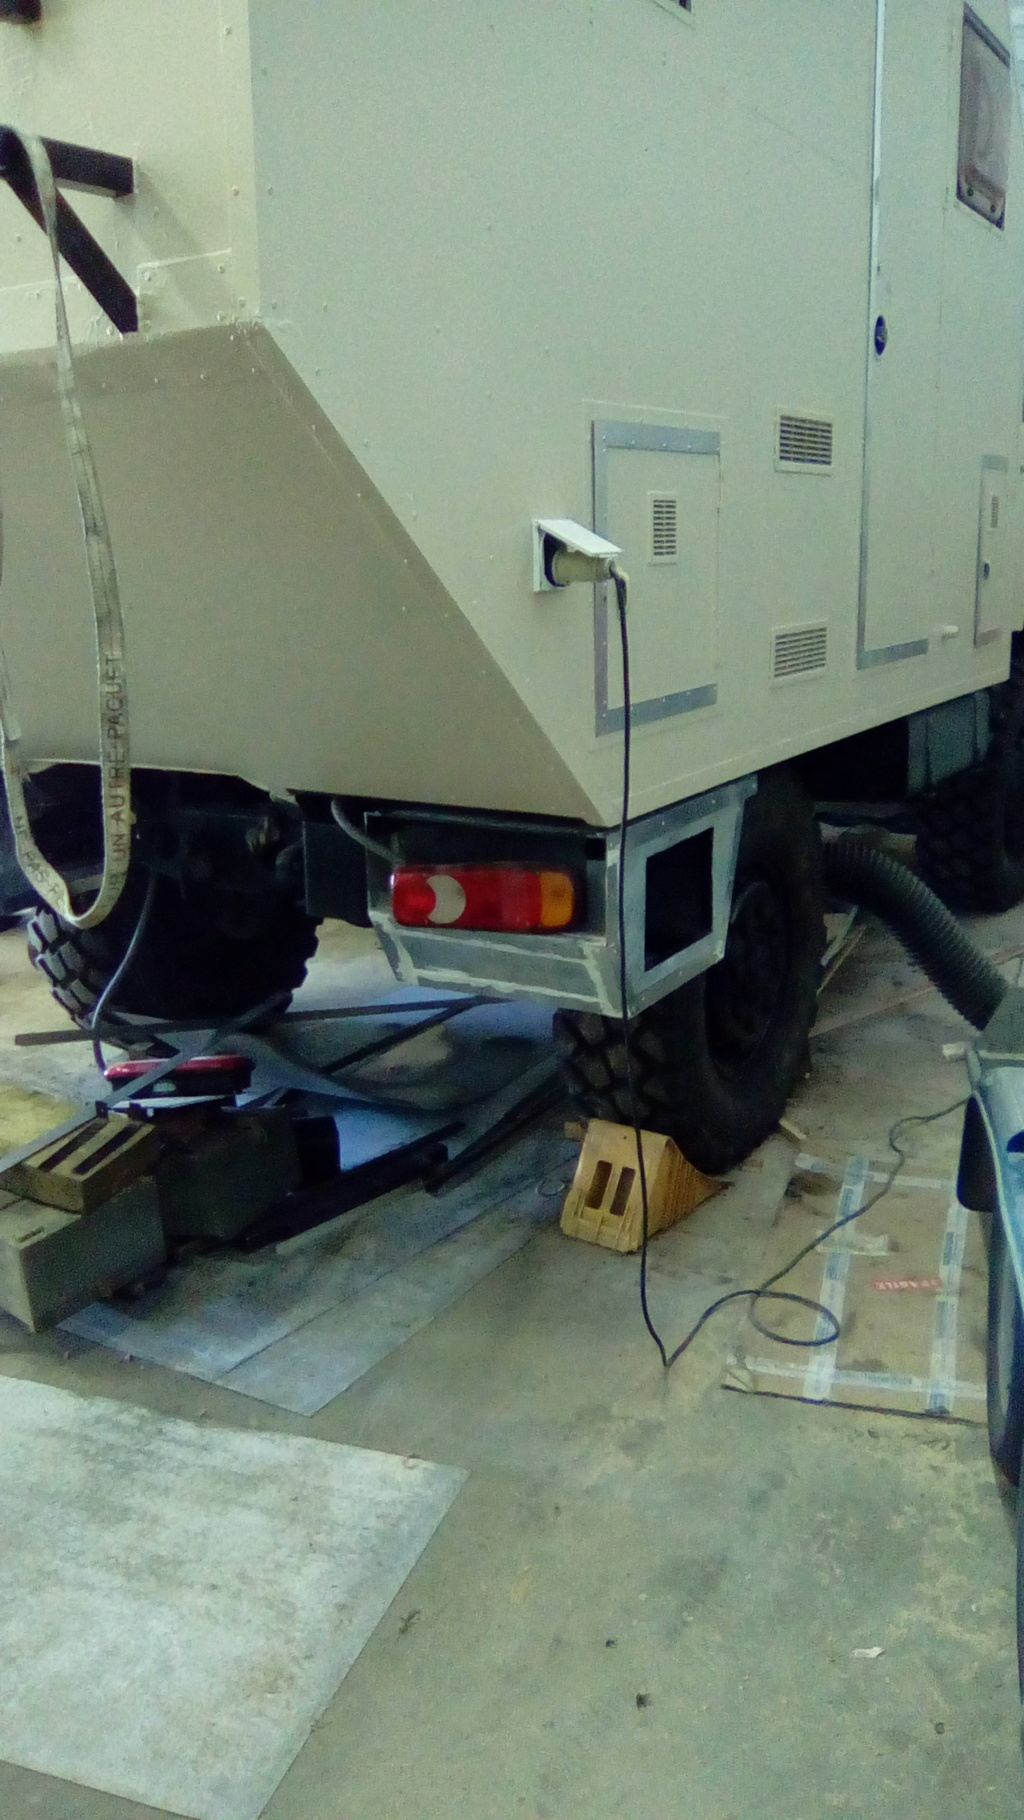 Projet camping car, ça avance ! - Page 11 Img_2025